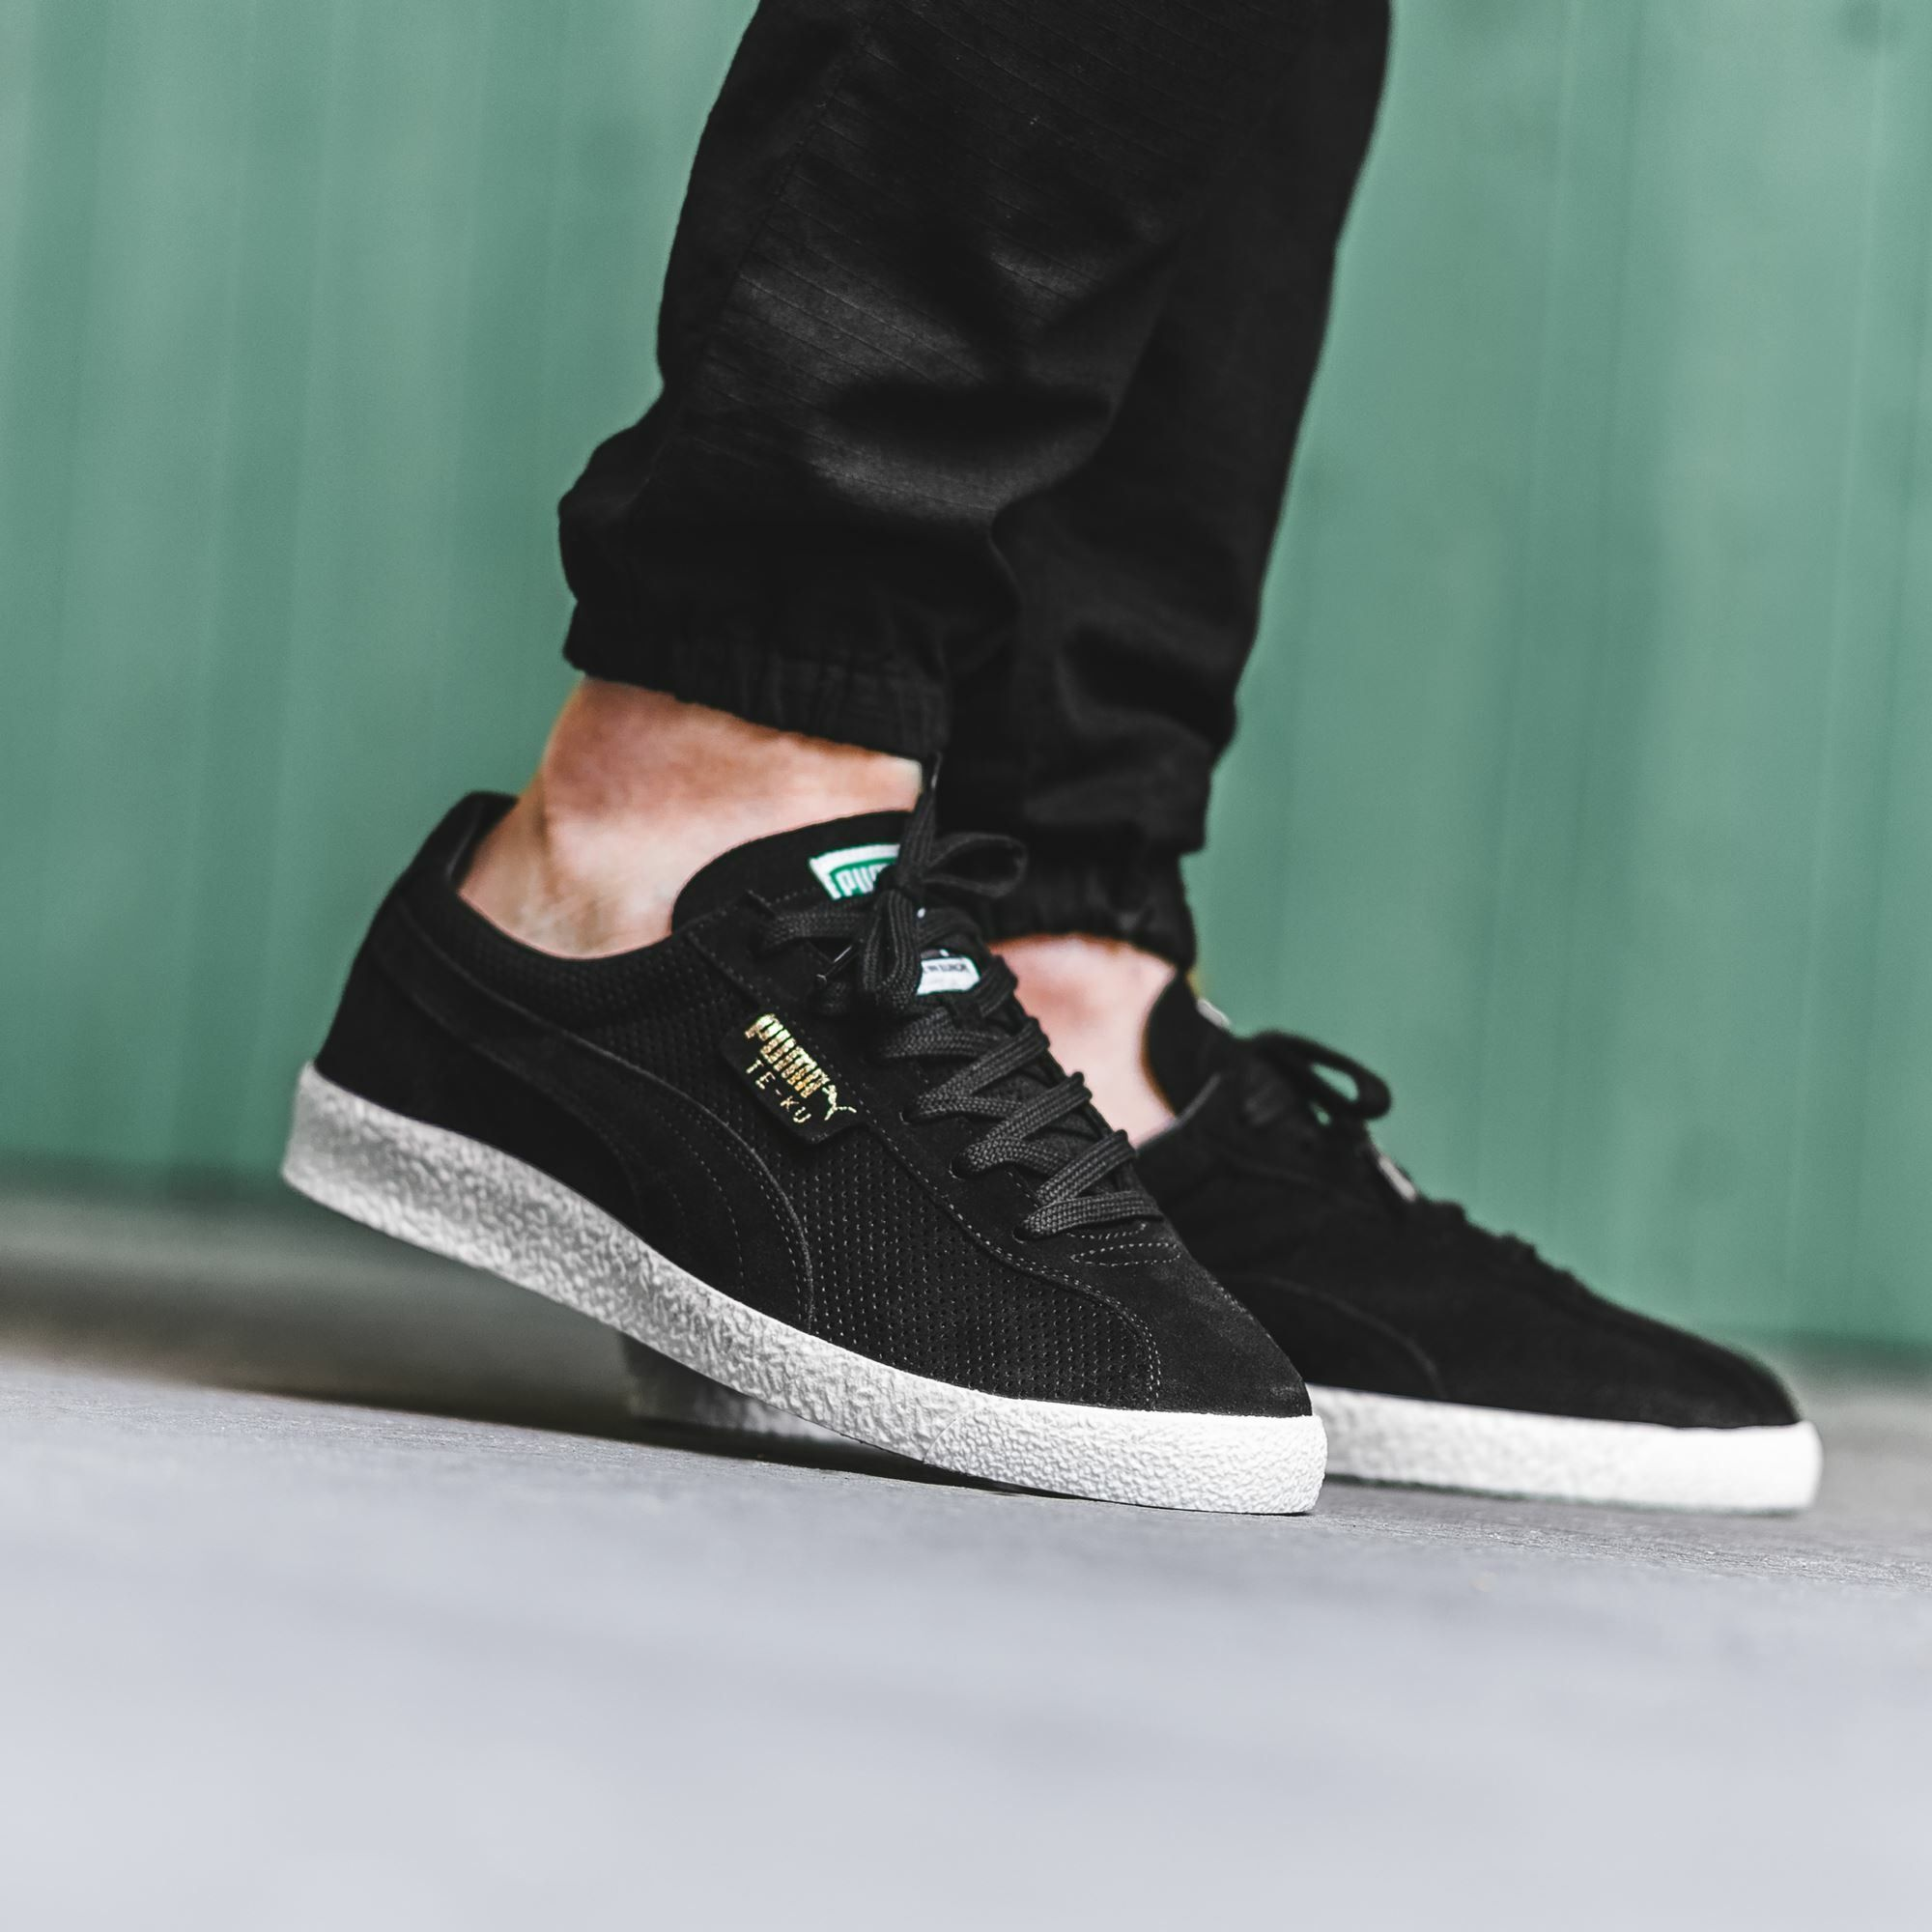 official photos 2c241 5982b Puma Te-Ku: Black | Sneakers: Puma Classics in 2019 | Shoes ...